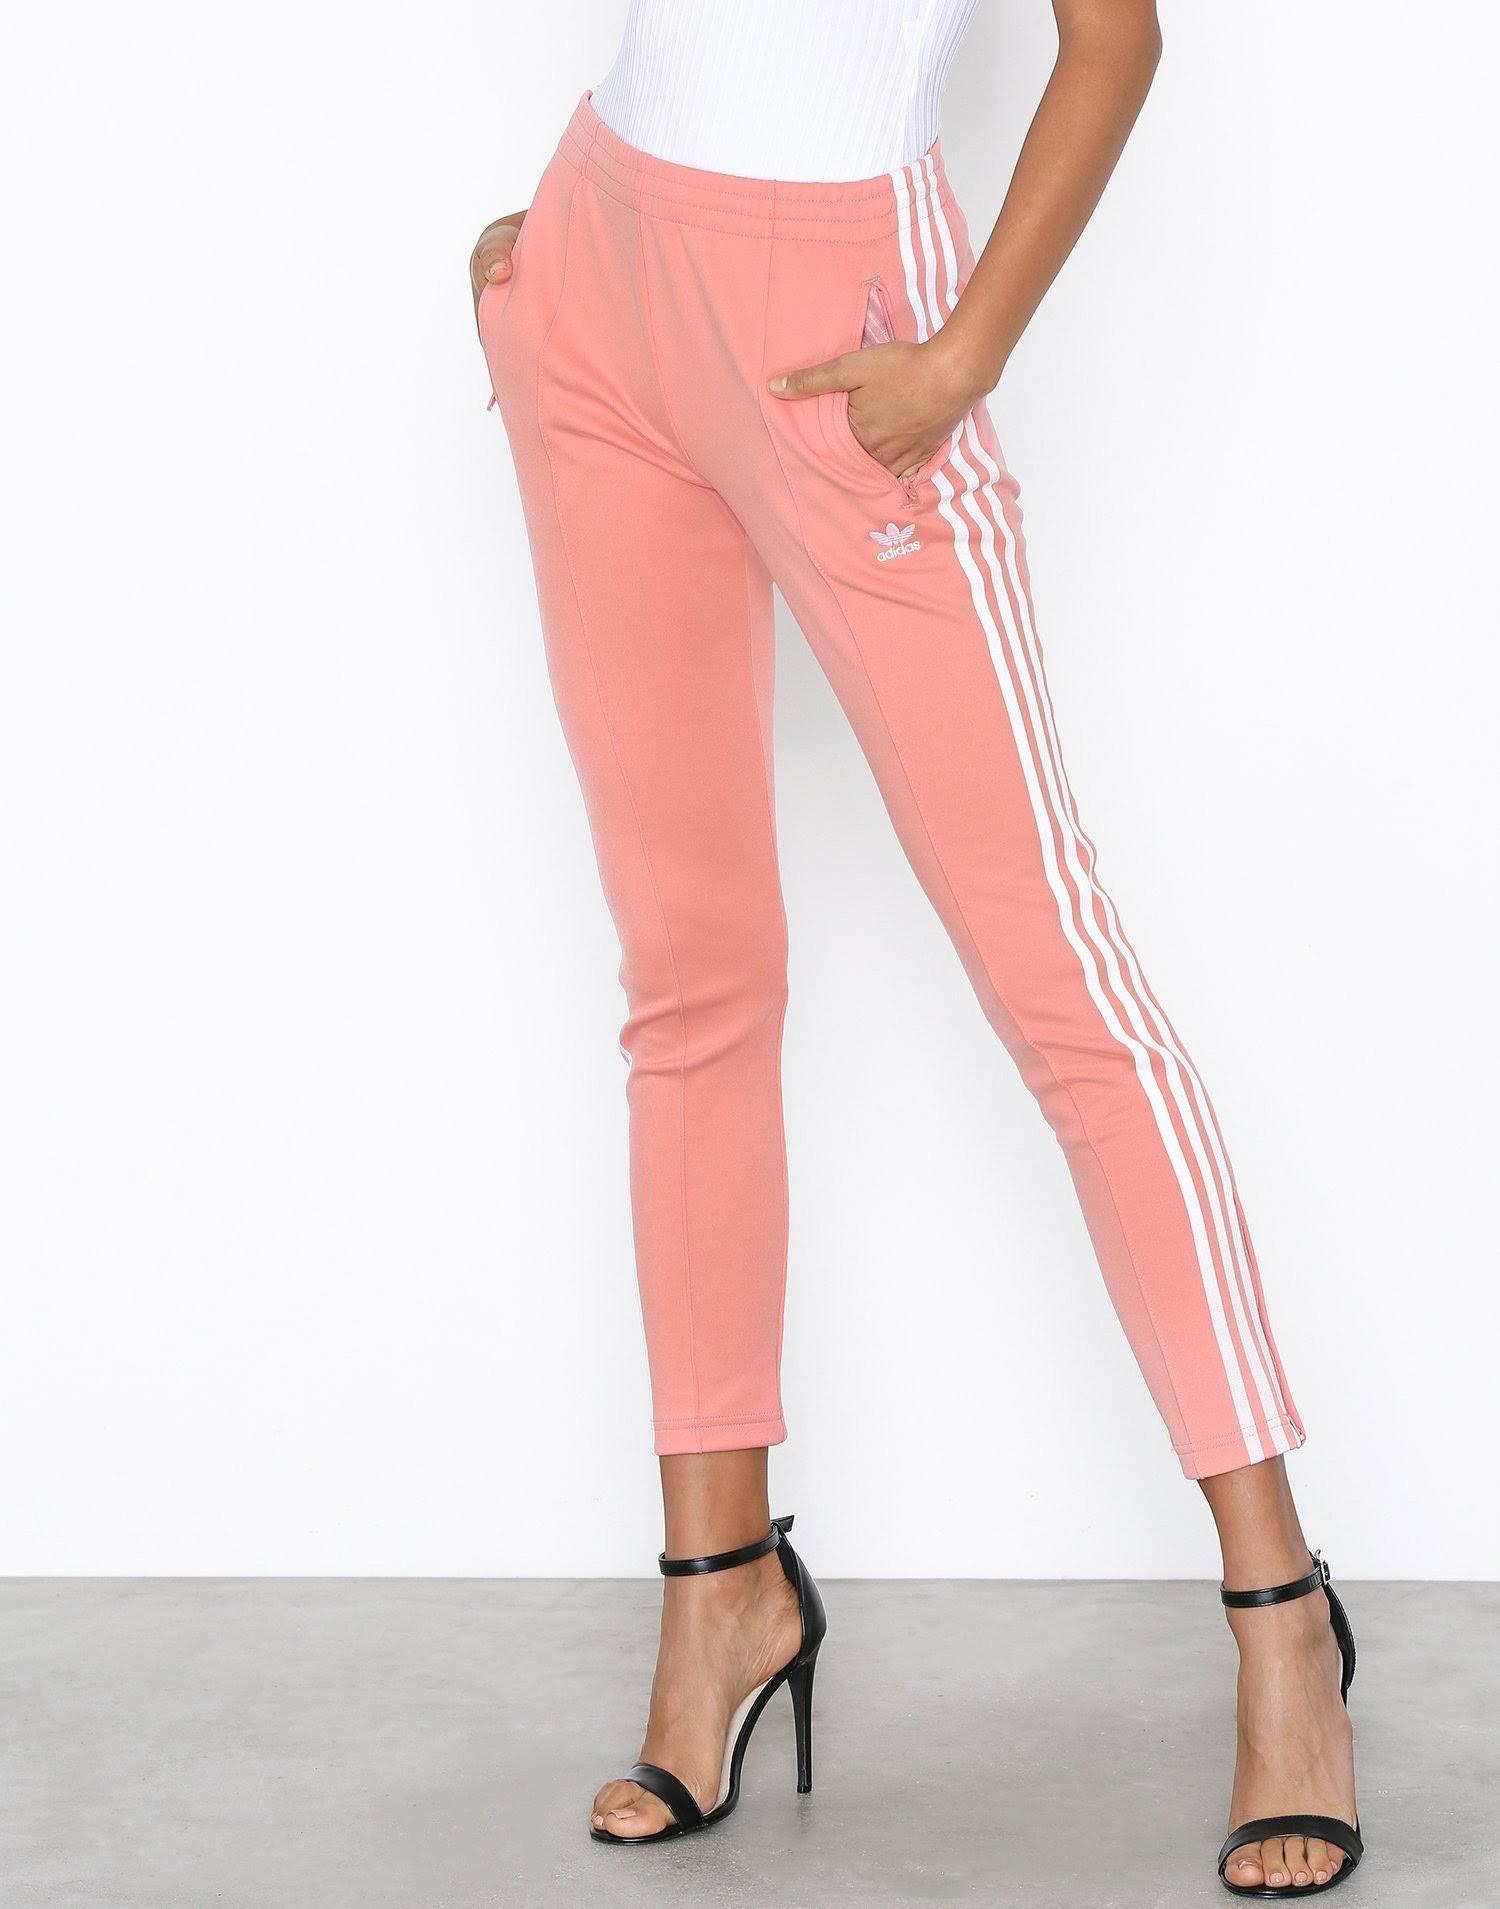 Originals rosa Adidas jogging Pantaloni Pink40 donna SST Tp In da da rWxBoedC